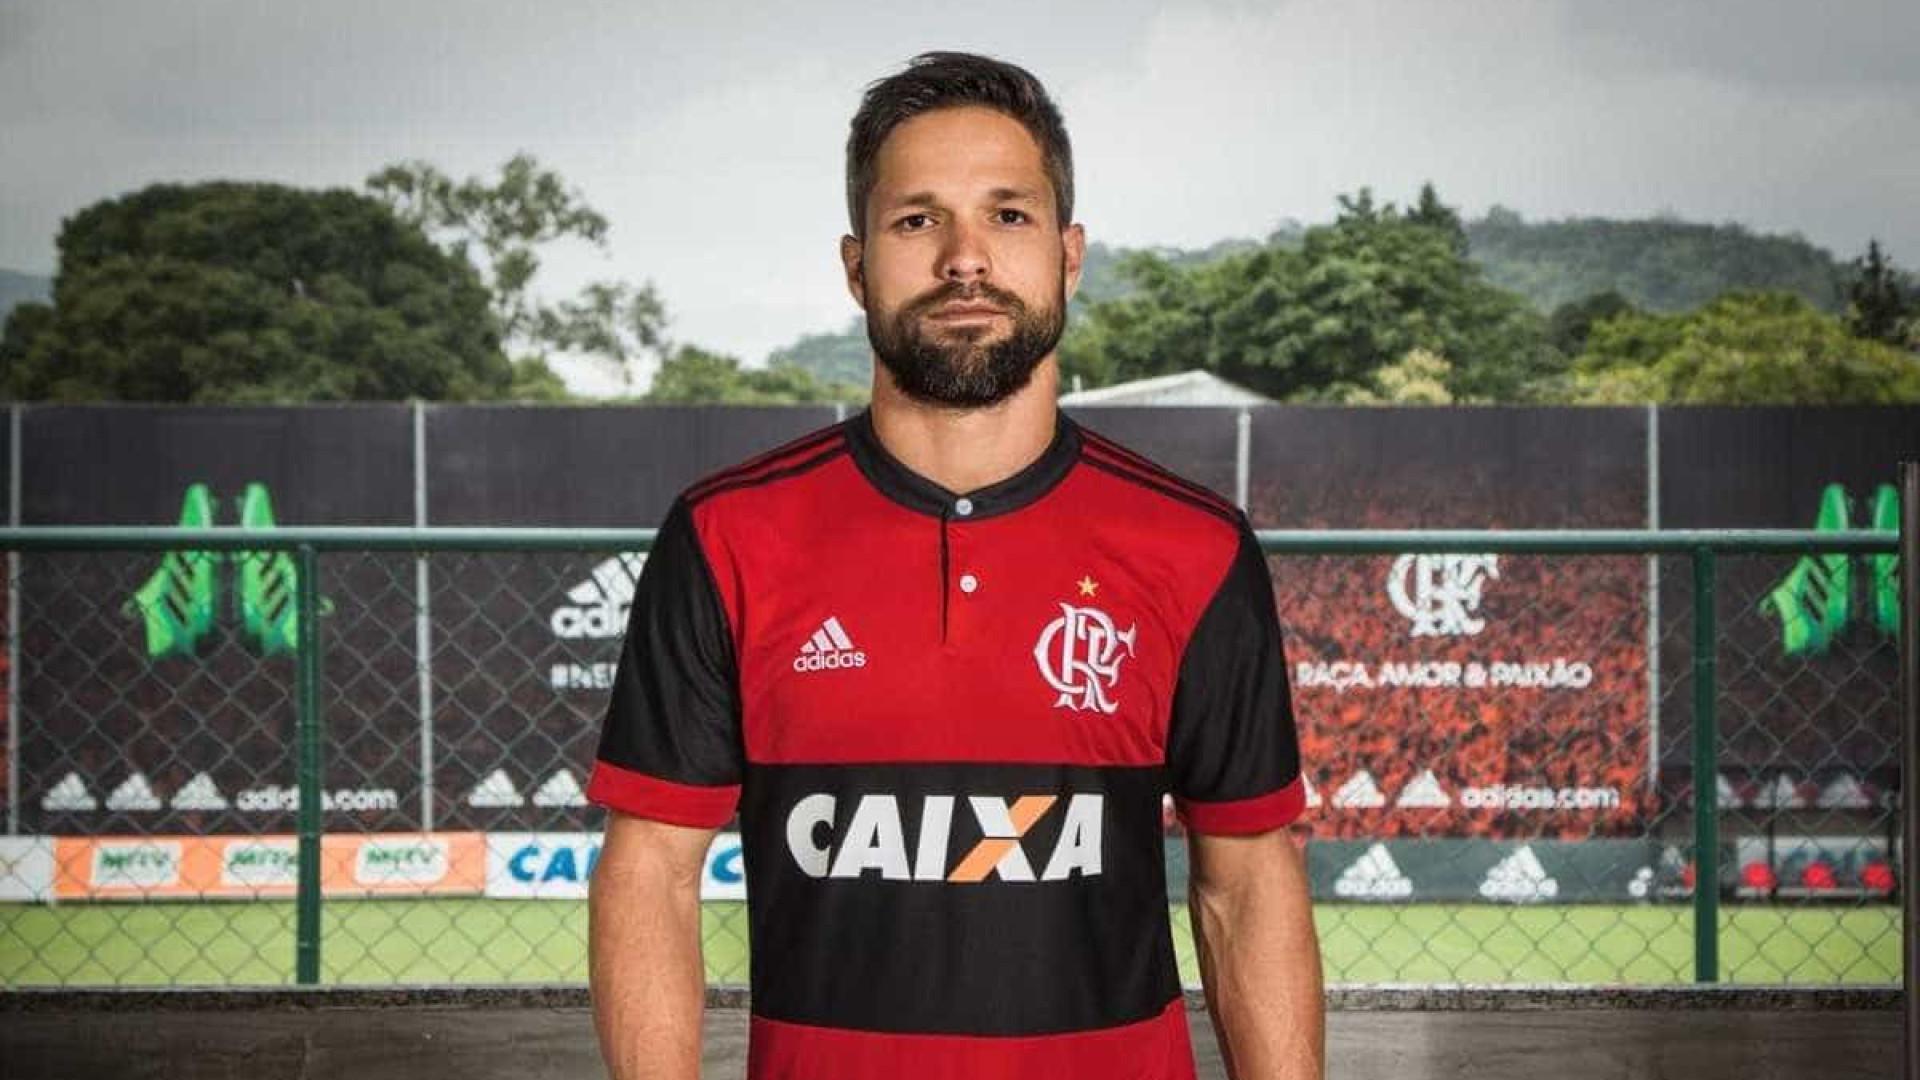 Flamengo Lança Nova Camisa, Inspirada Na 'era Zico